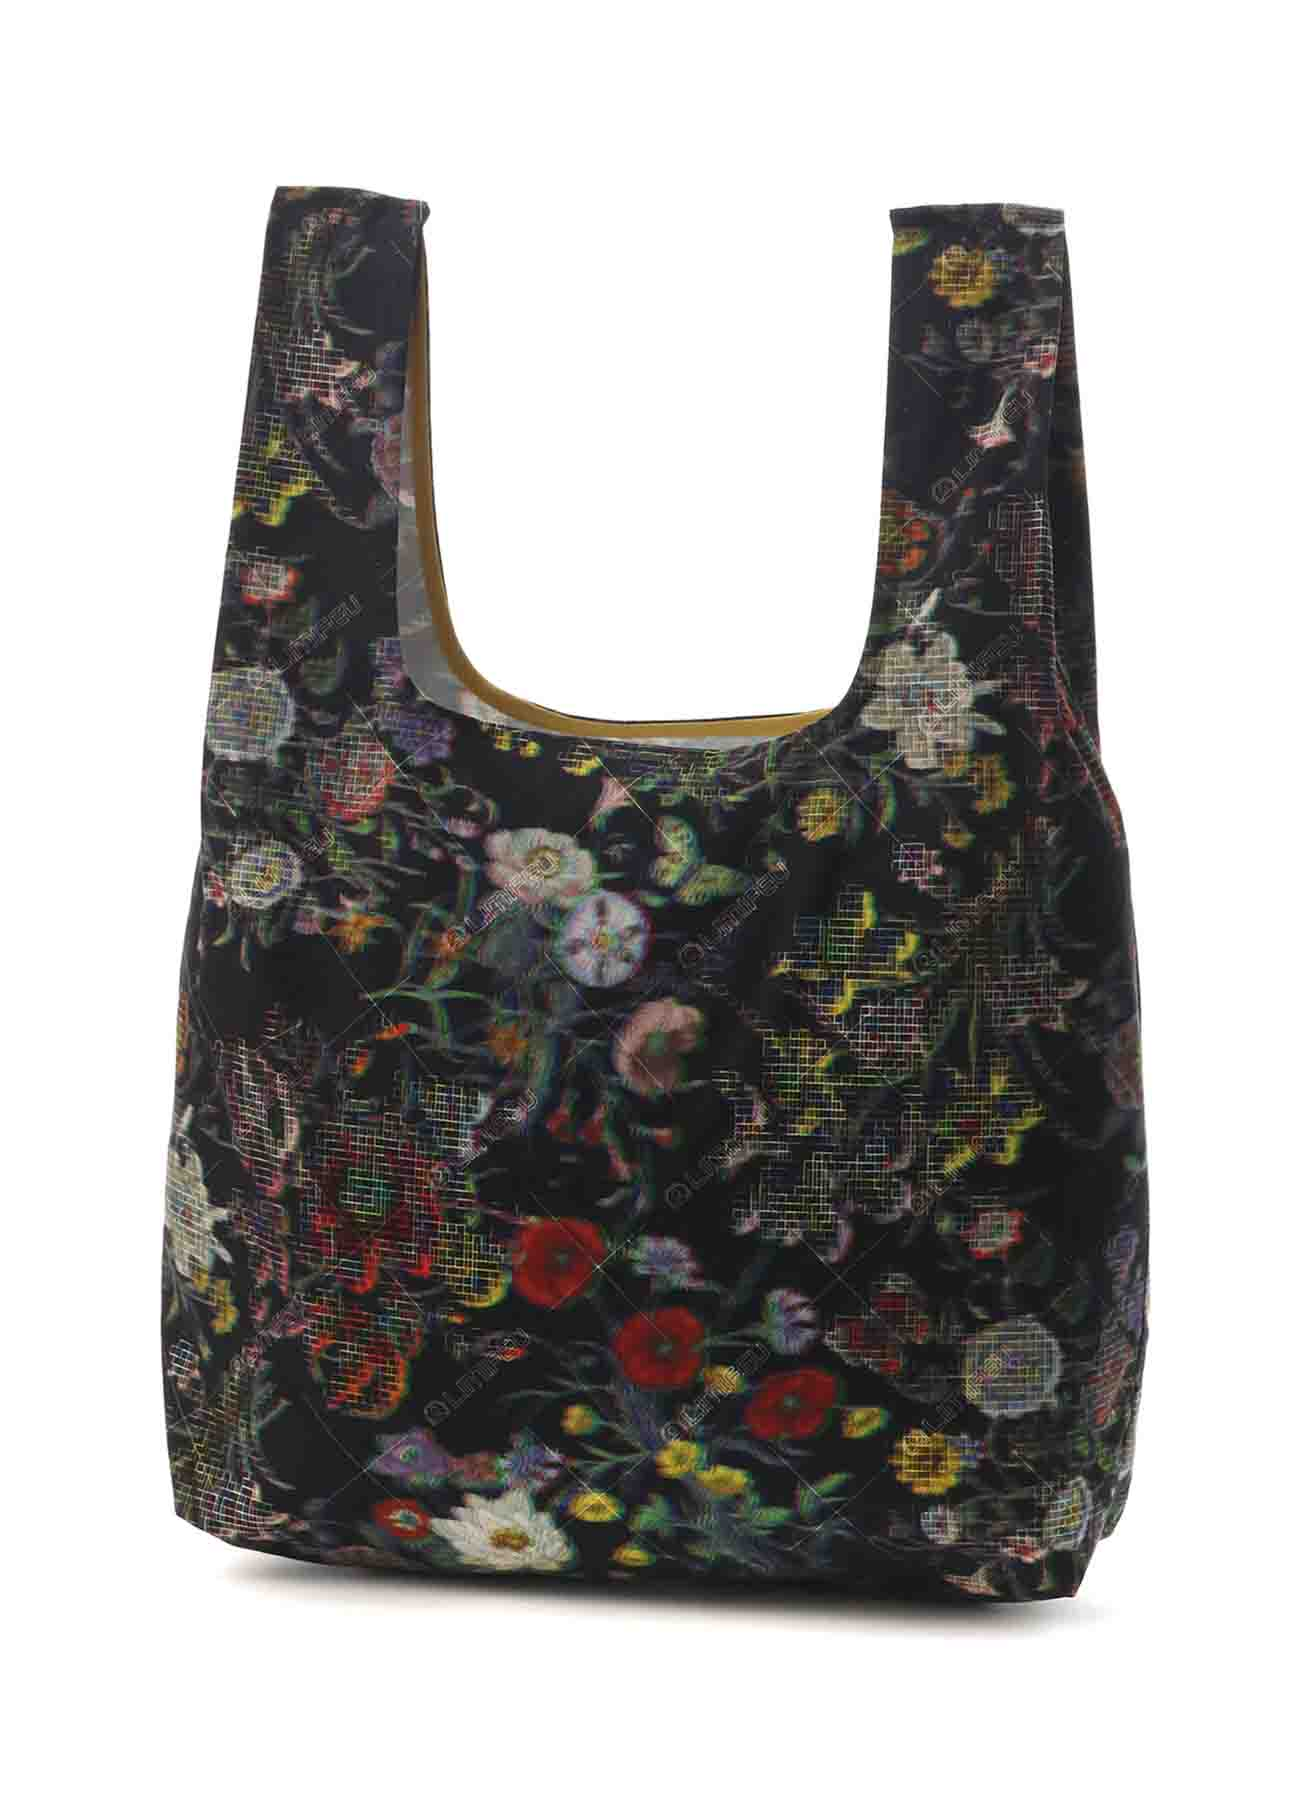 Mosaic Flower Print Cotton Shopping Bag